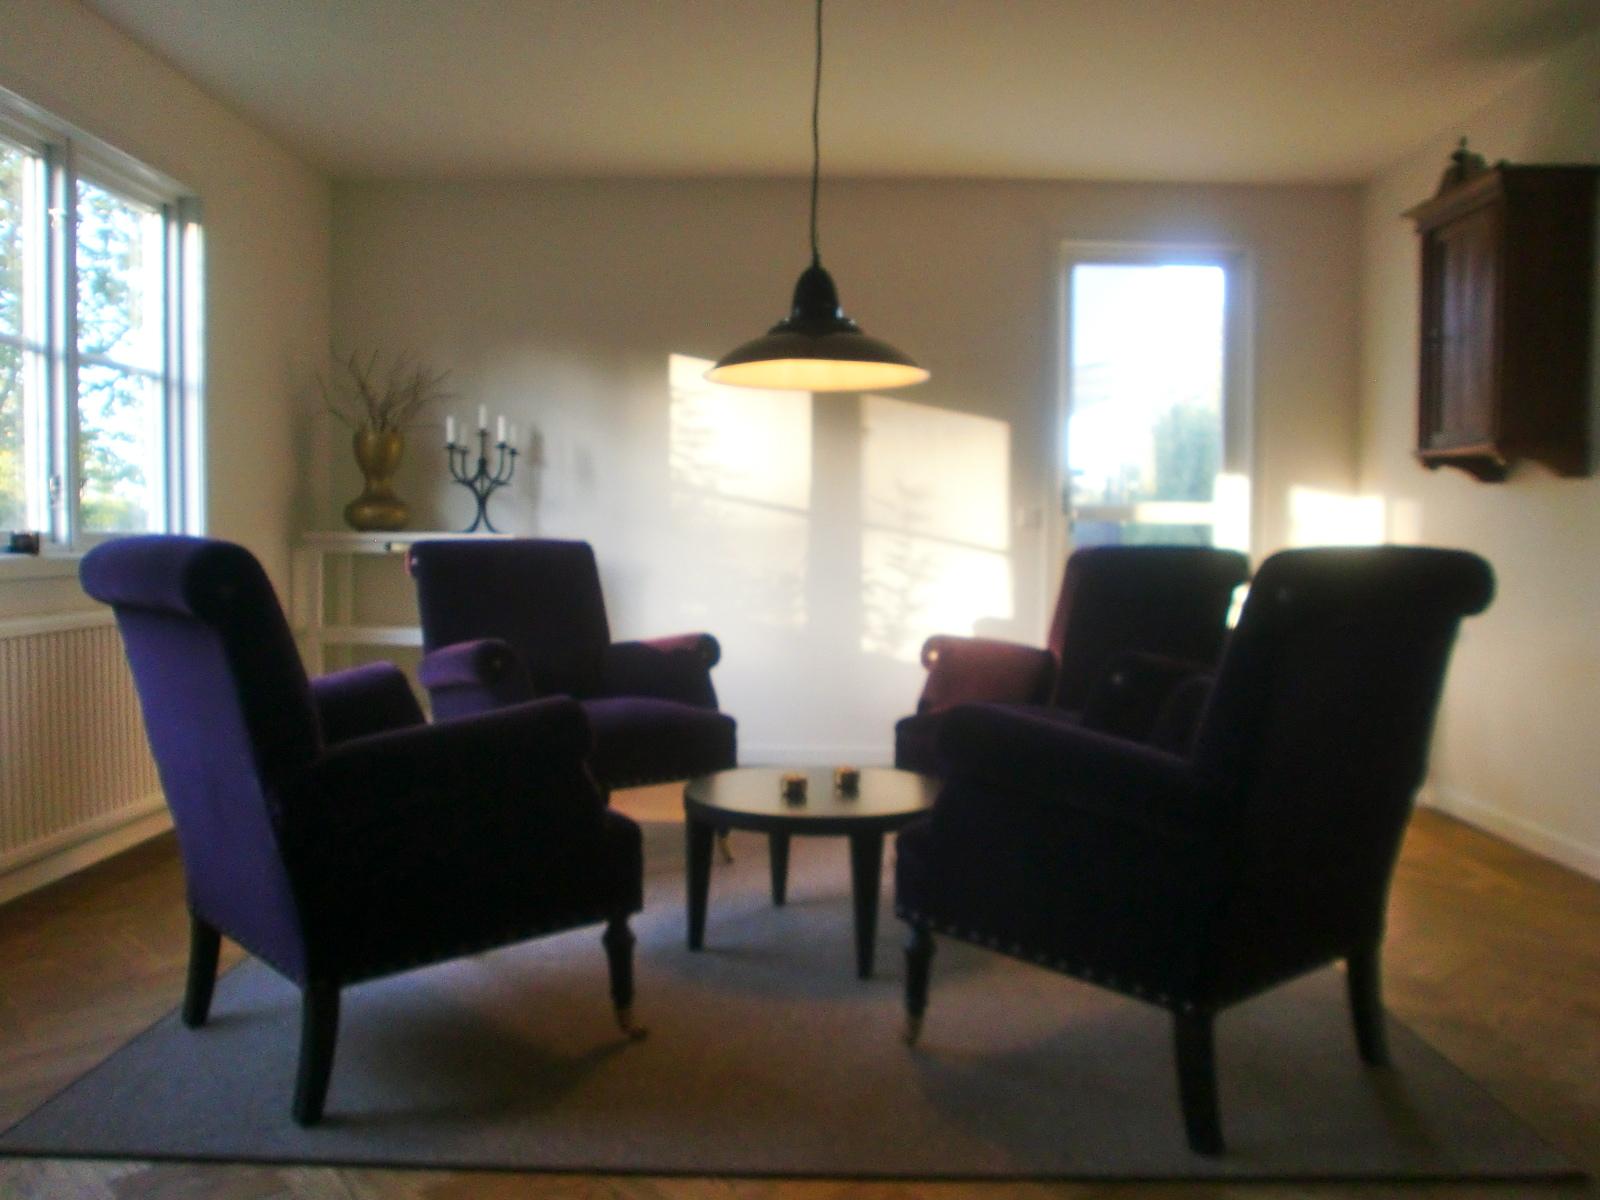 Hus inspiration inredning: lila i vardagsrummet